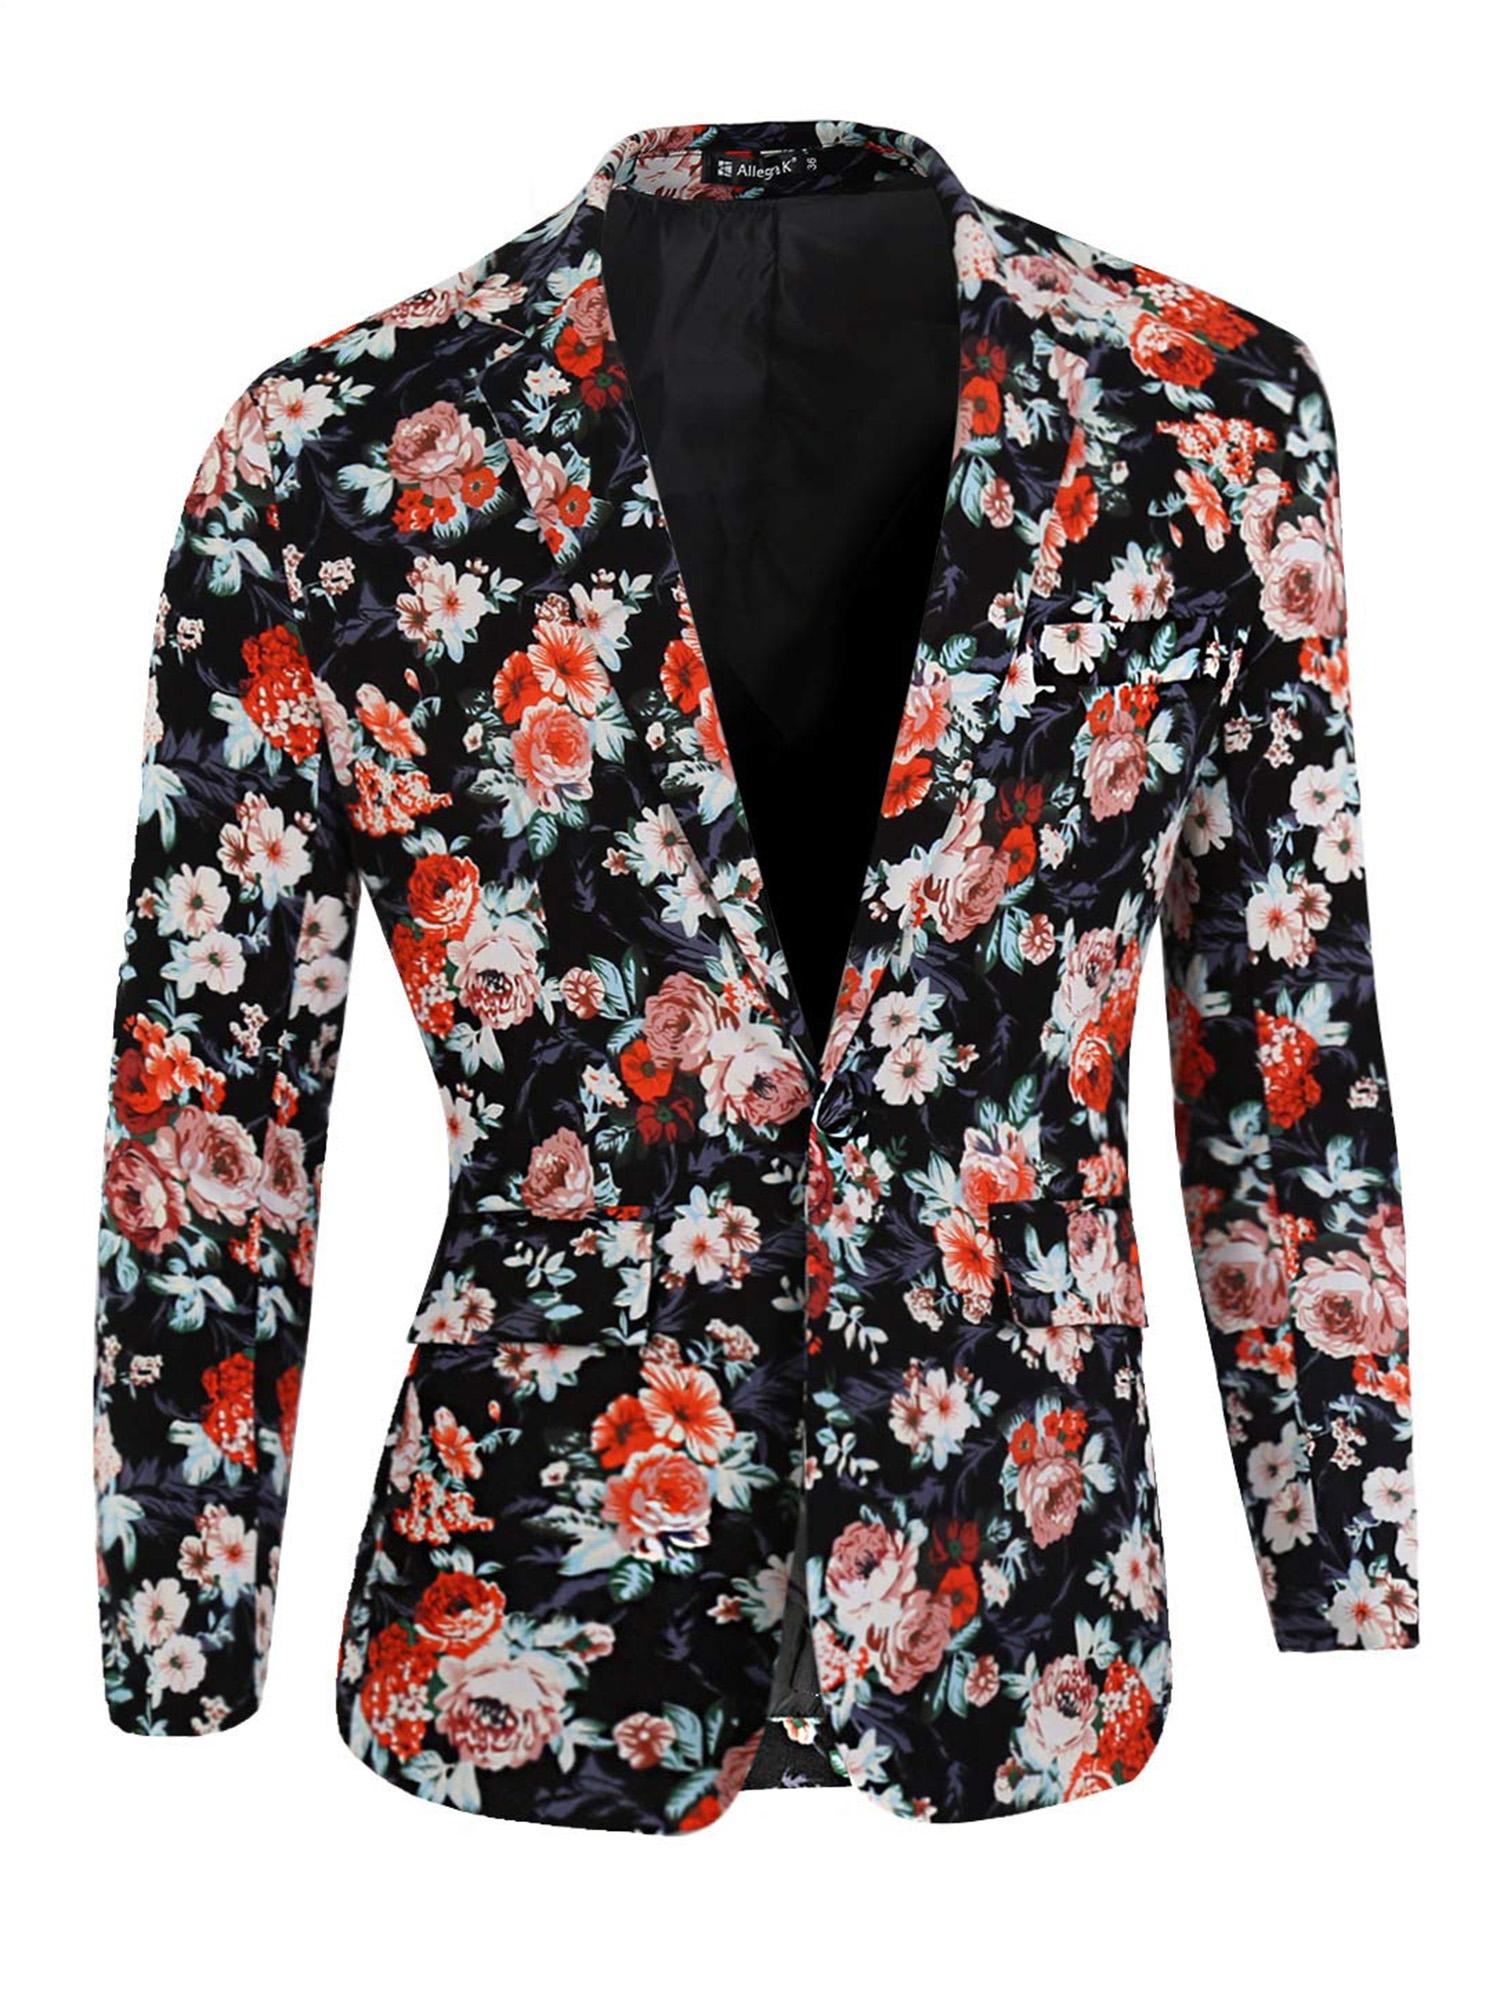 Men's Prom Floral Slim Fit Suit Blazer Jacket Black Coral Pale Pink 34